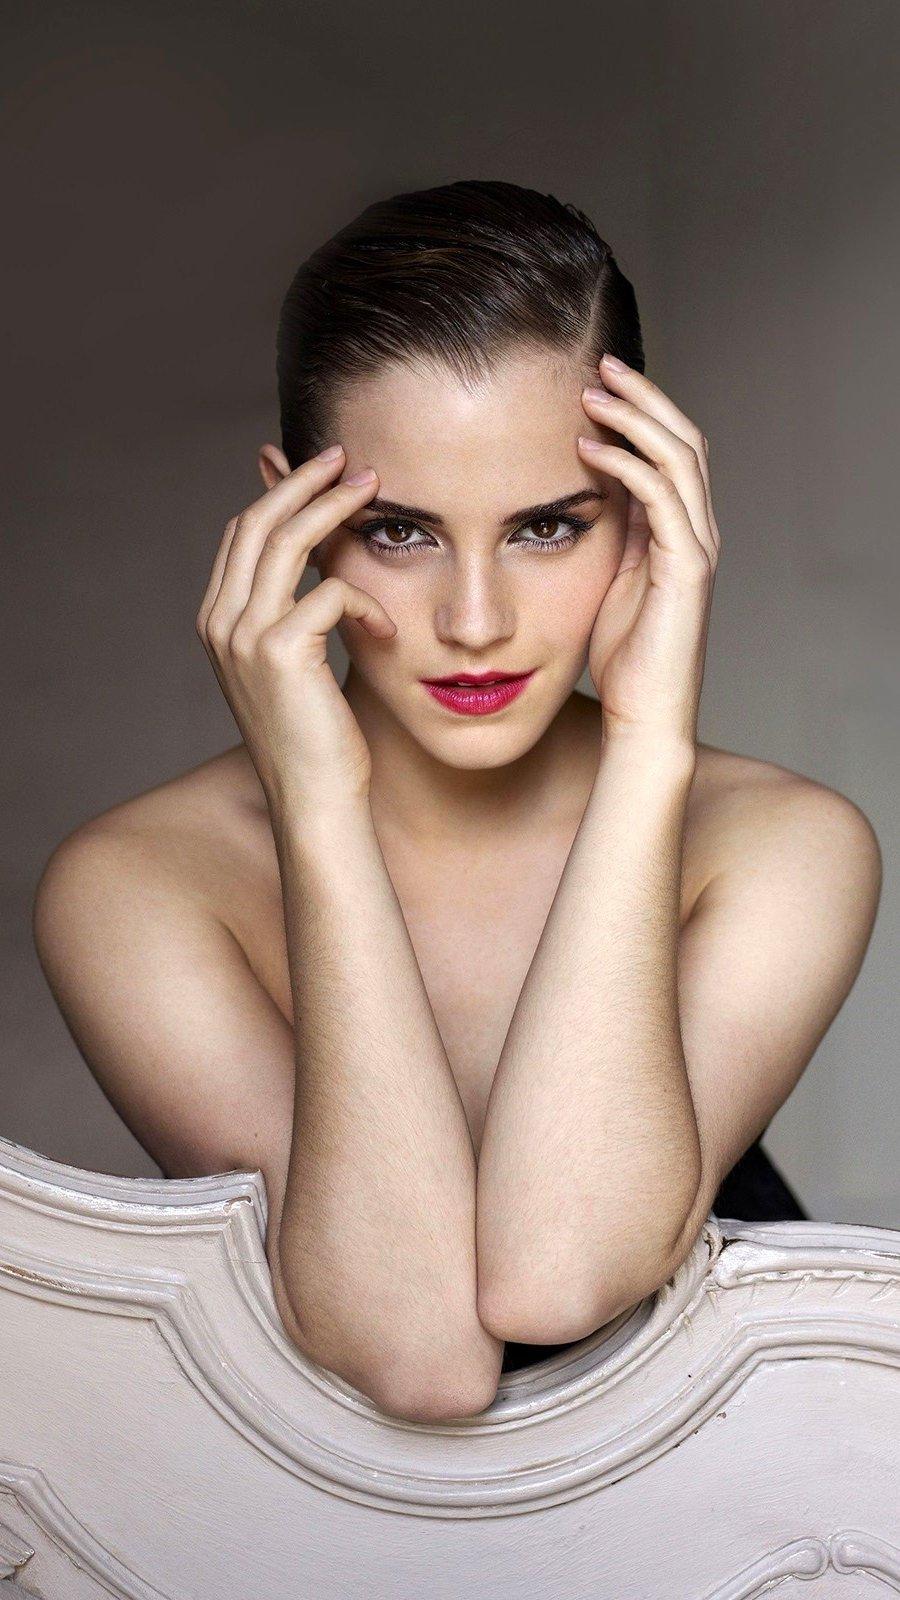 Wallpaper Emma Watson with makeup Vertical